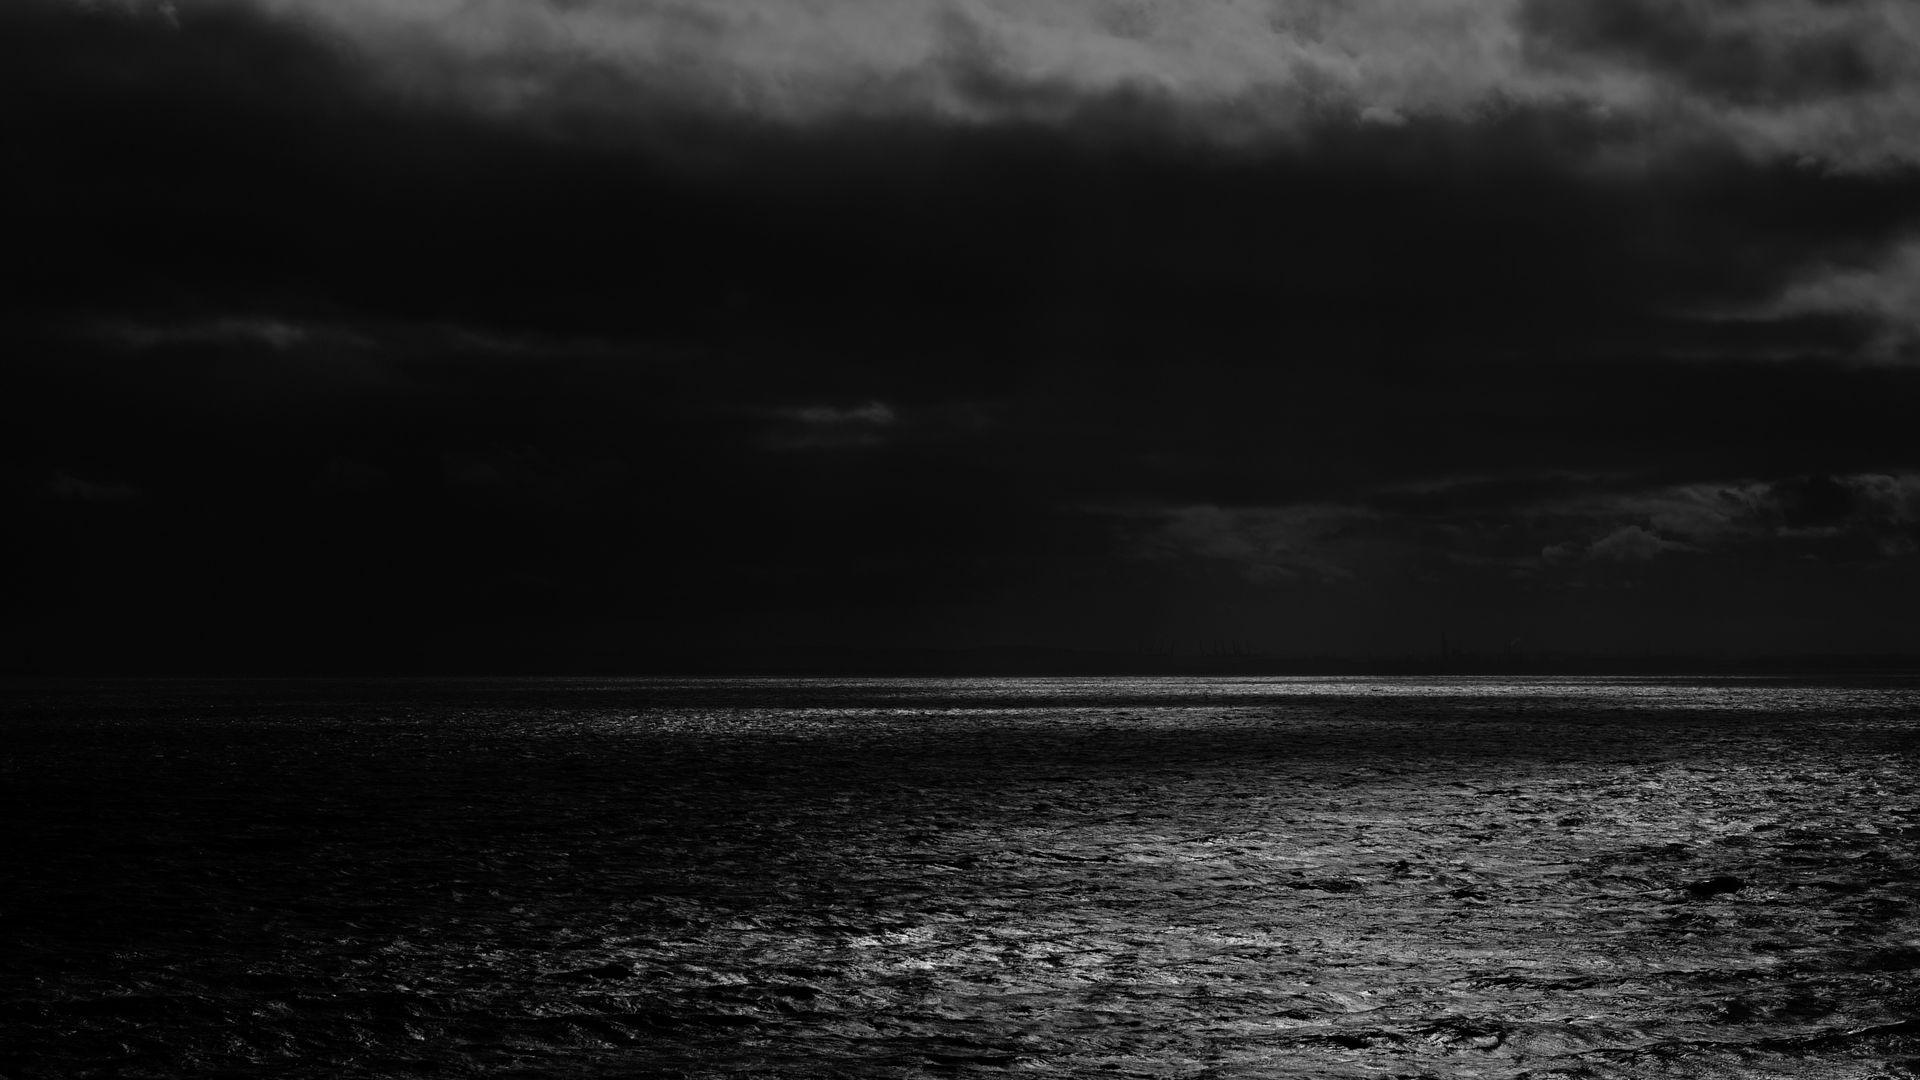 1920x1080 Wallpaper sea, horizon, bw, overcast, clouds, ripples